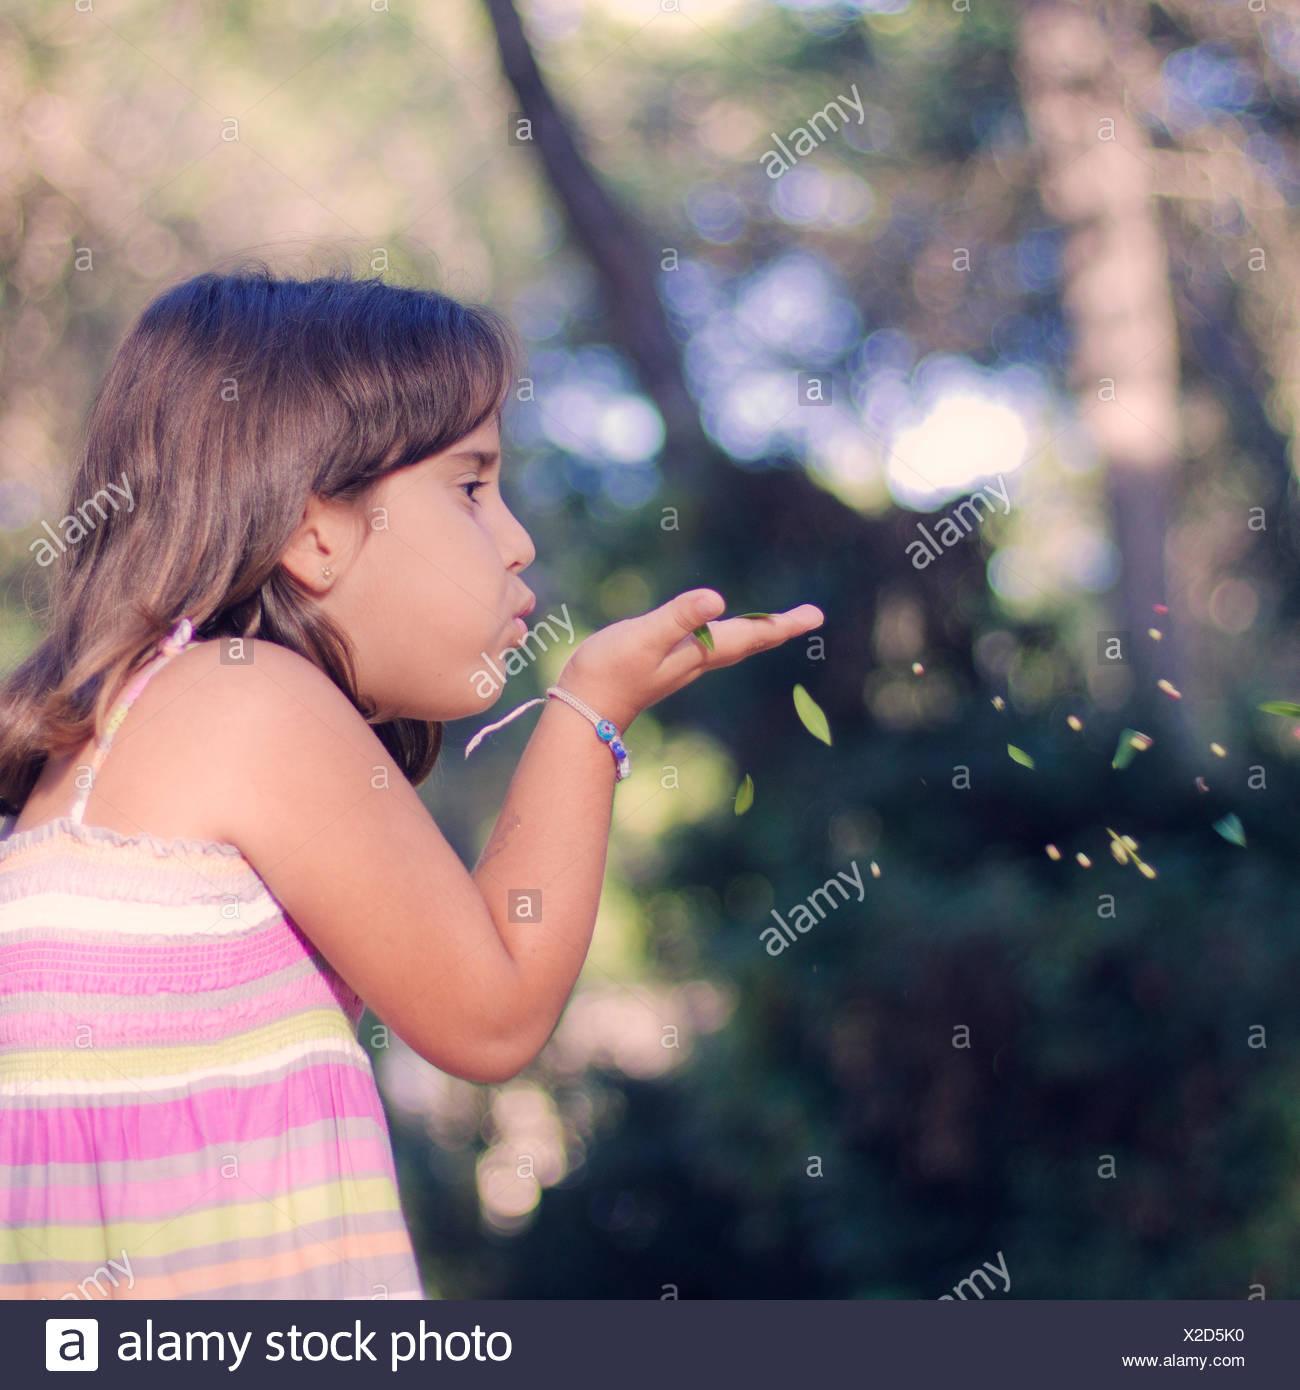 Chica (6-7) sopla hojas de mano Imagen De Stock